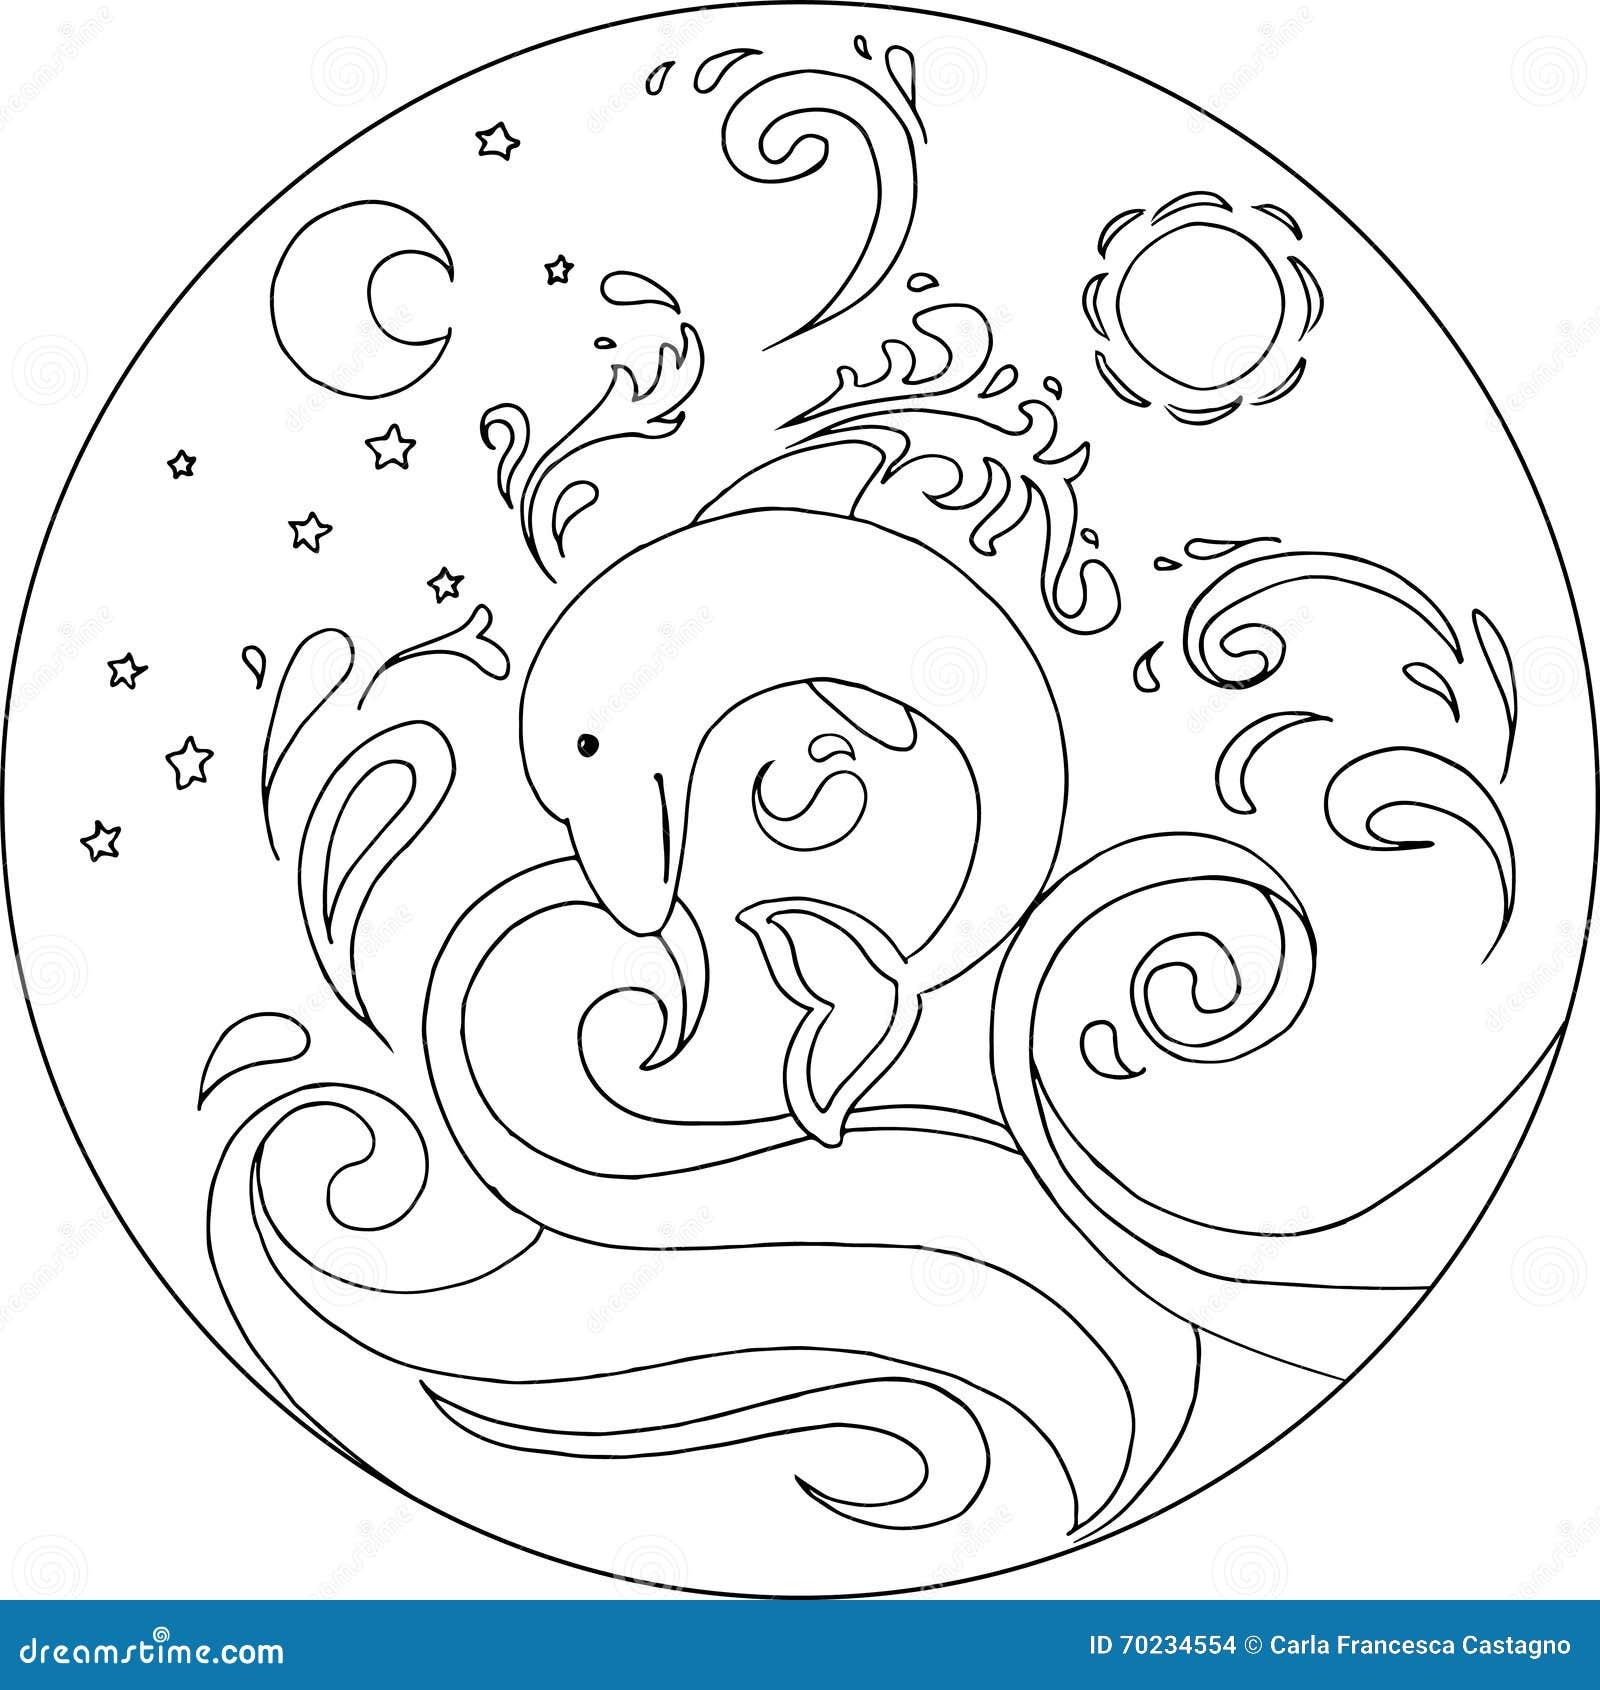 water mandala coloring pages | Coloring Dolphin Mandala stock vector. Illustration of ...